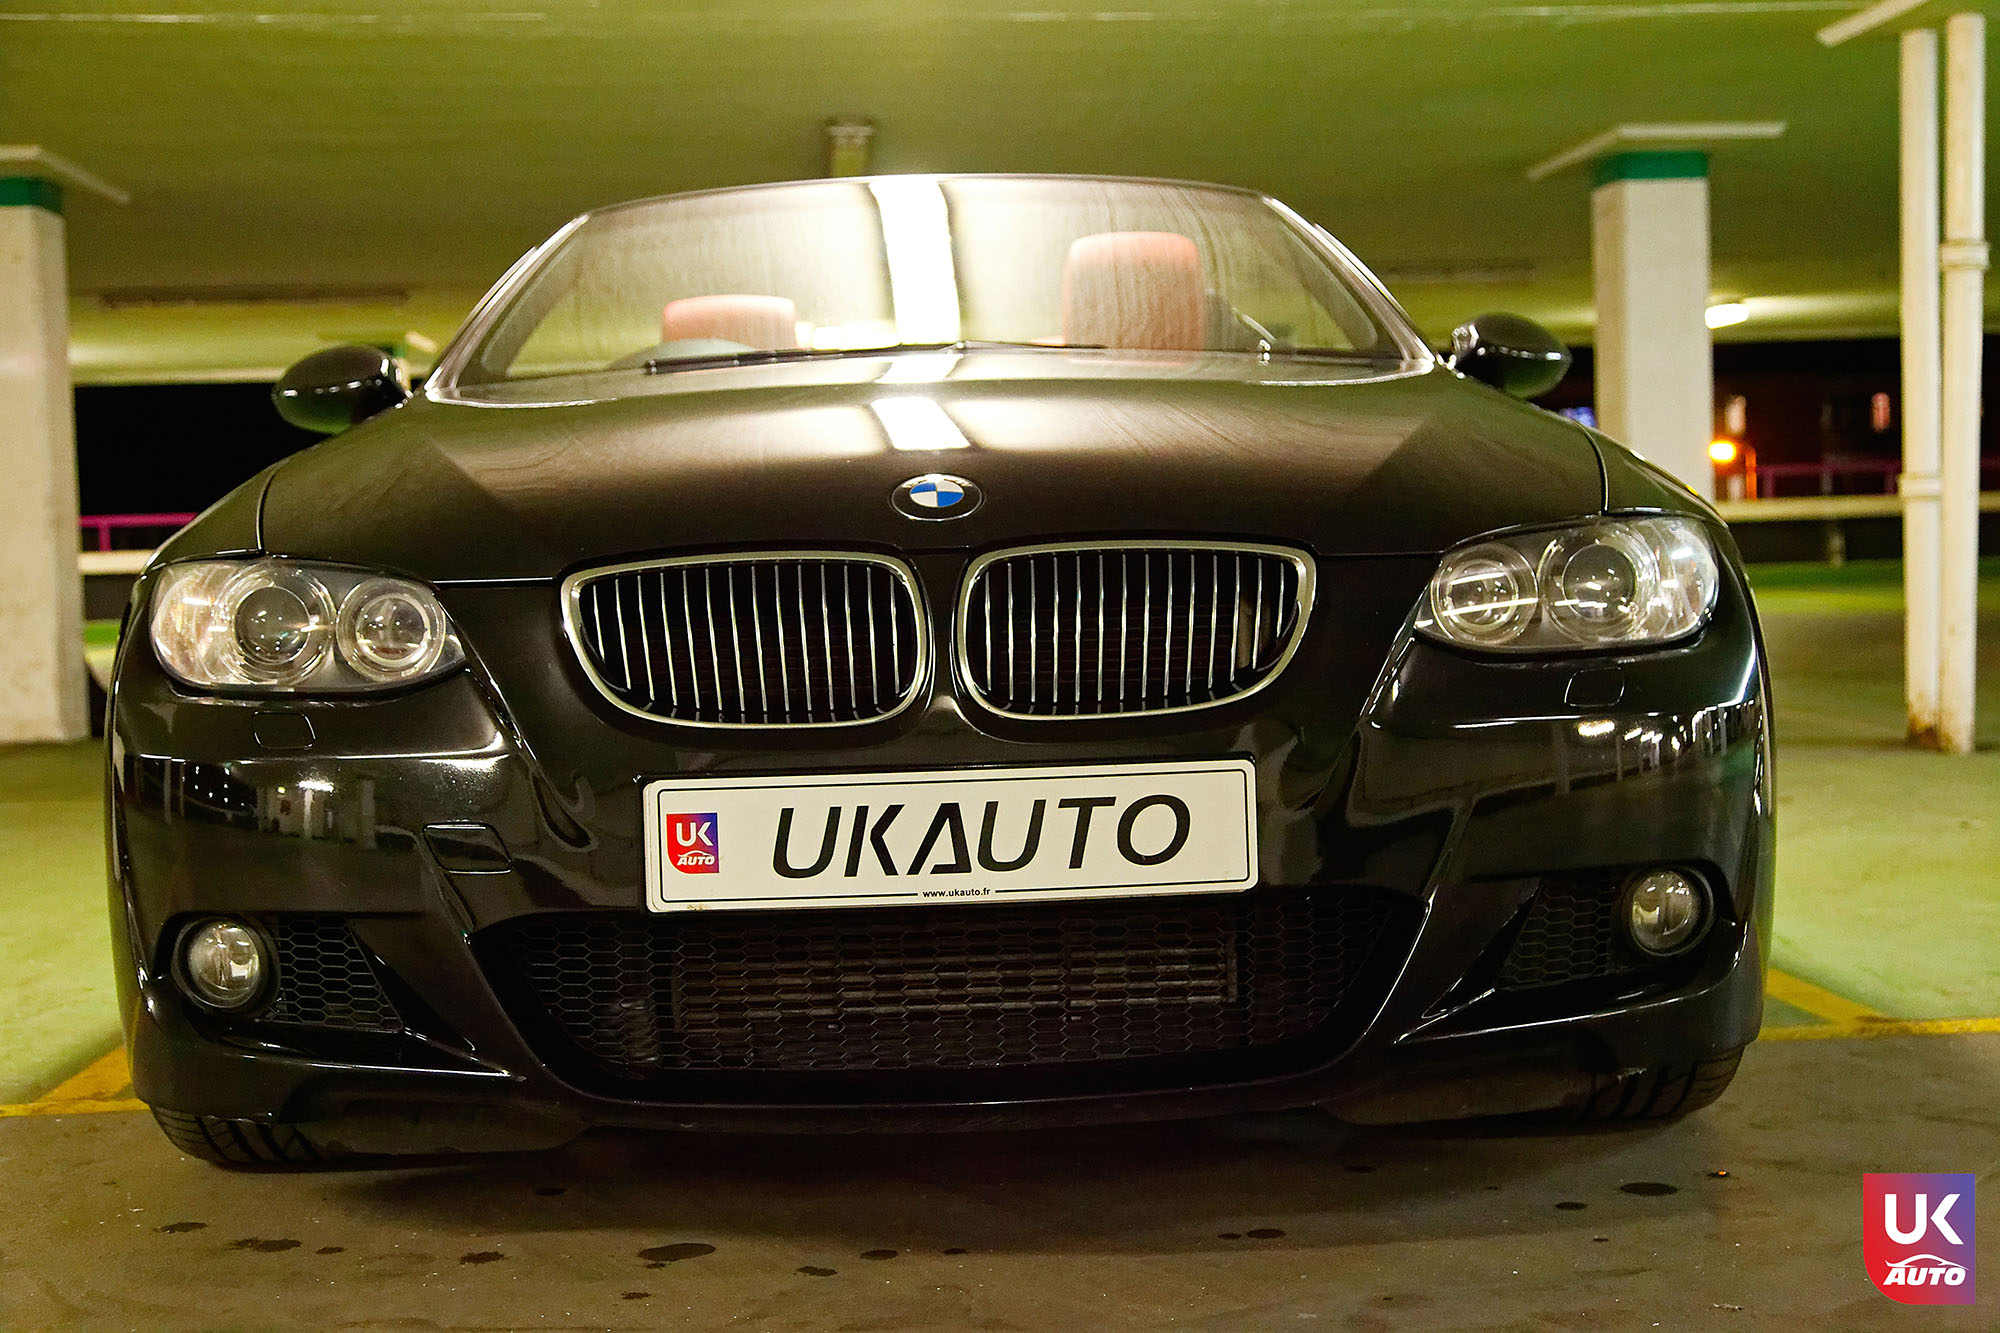 UKAUTO IMPORT ANGLETERRE BMW 335i CABRIOLET UKA RHD5 - Felecitation a Jeremie pour cette BMW 335i cabriolet RHD PACK M IMPORT AUTO ANGLAISE